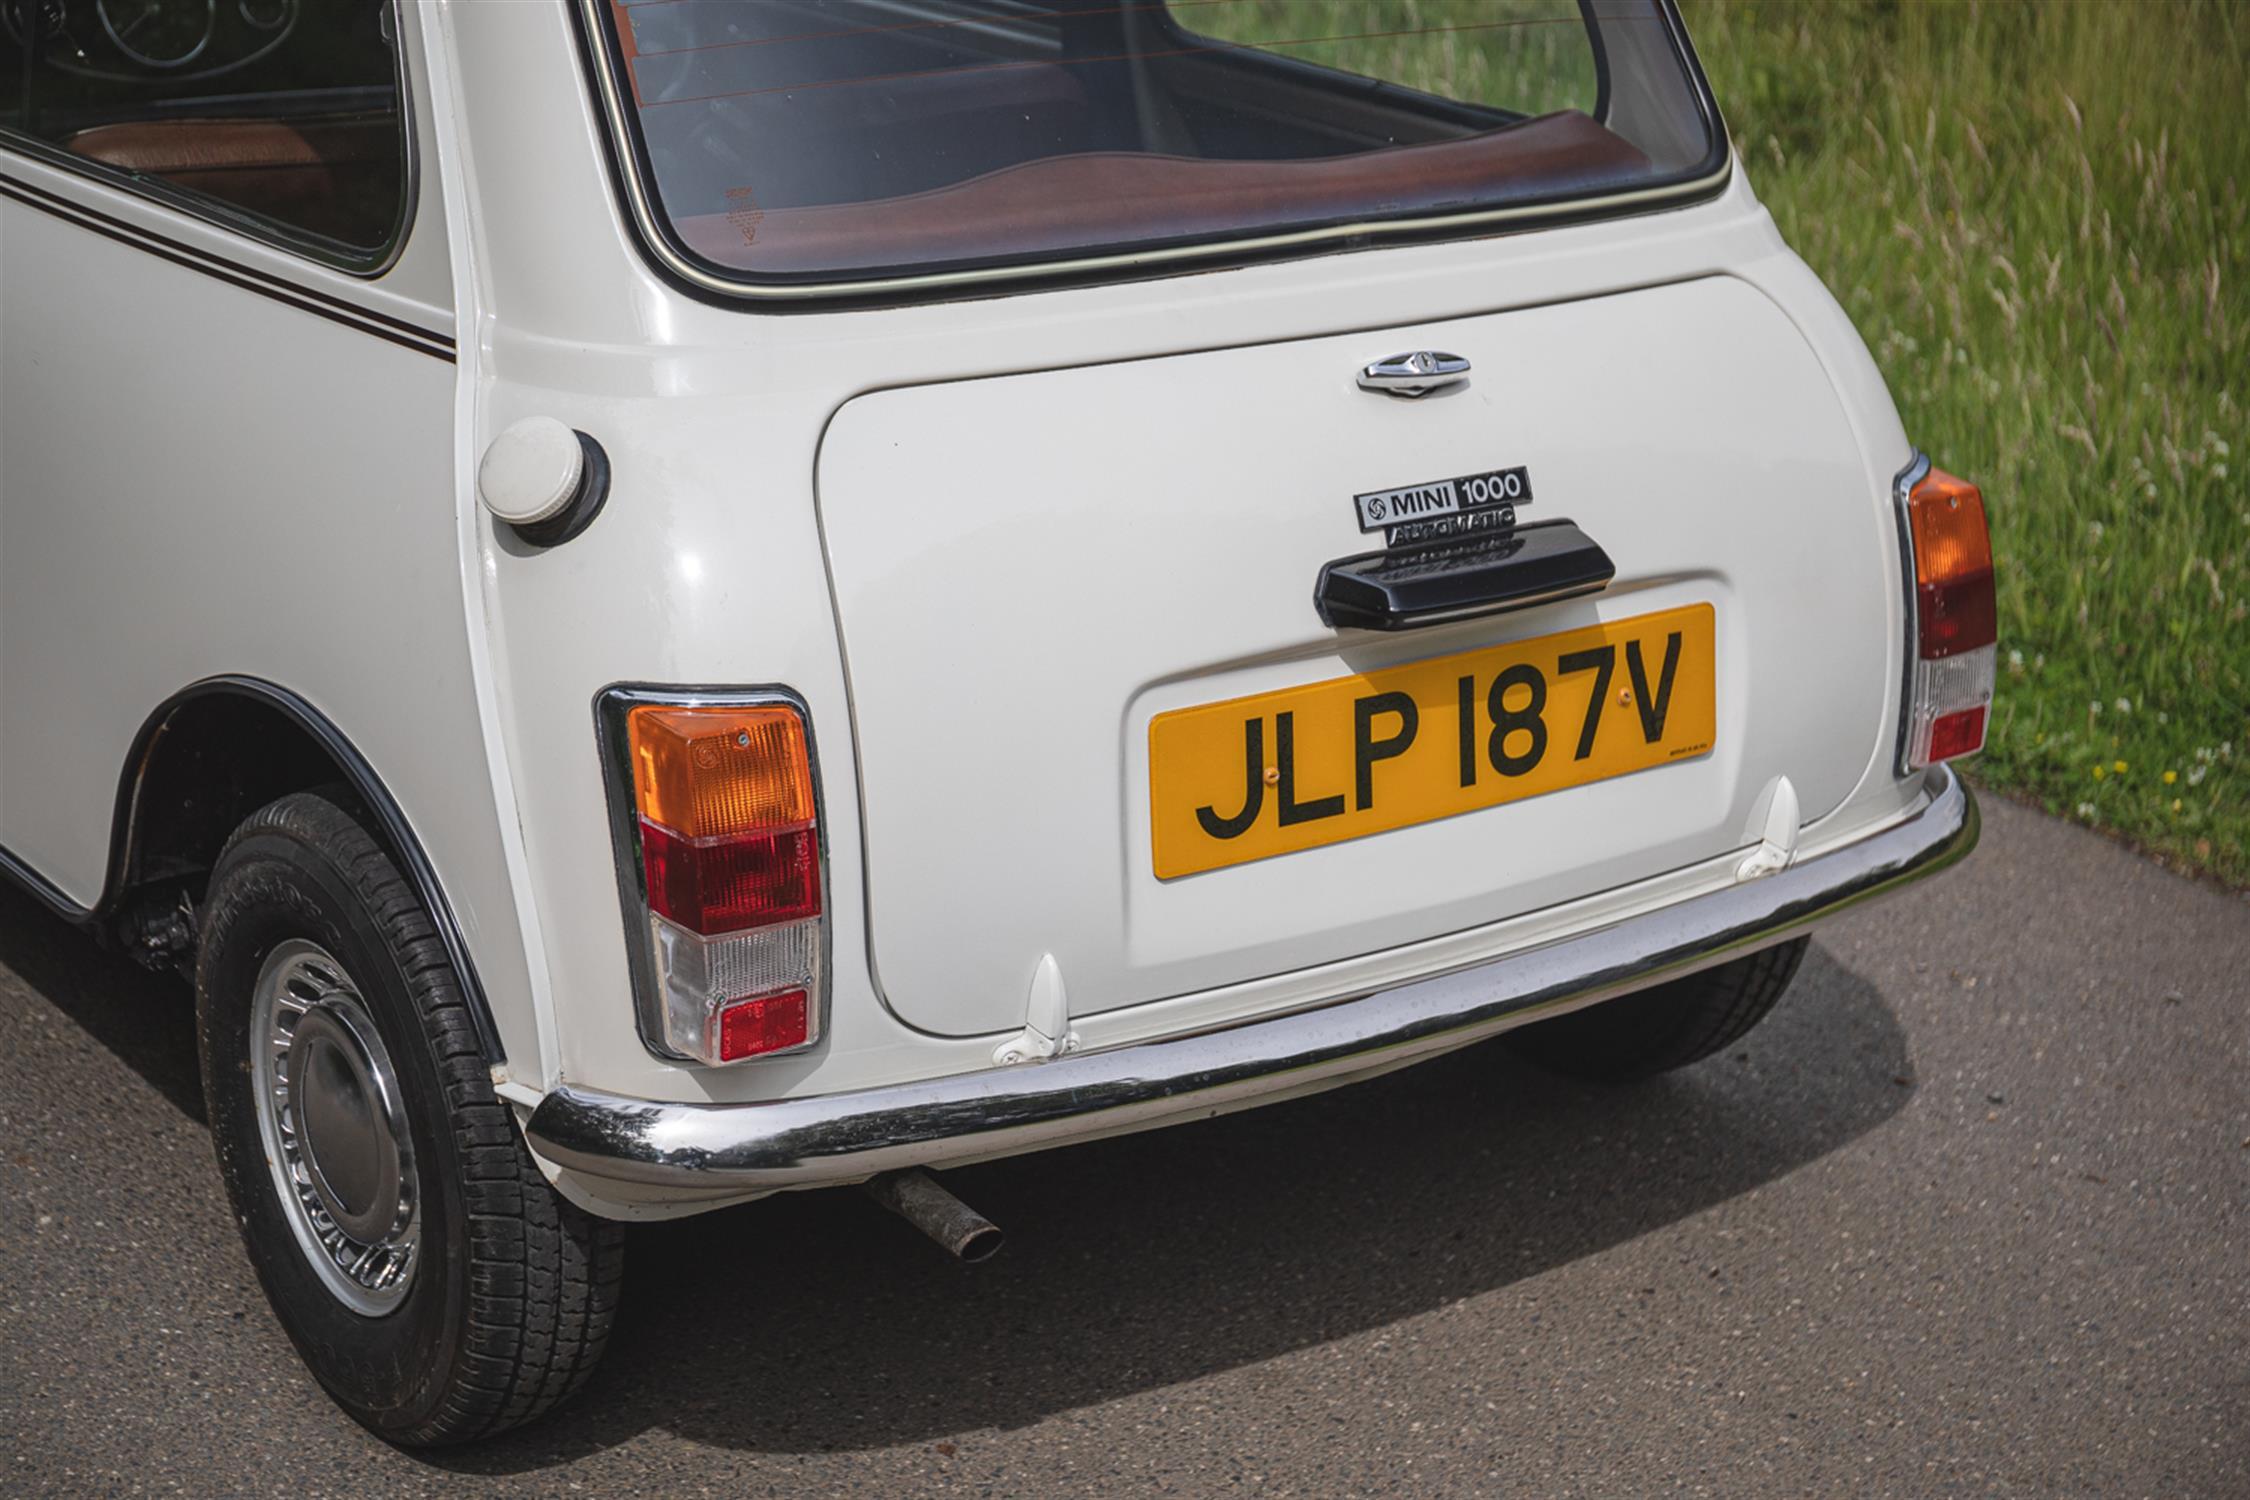 1979 Austin Mini 1000 (Auto) - 2,699 Miles - Image 9 of 10